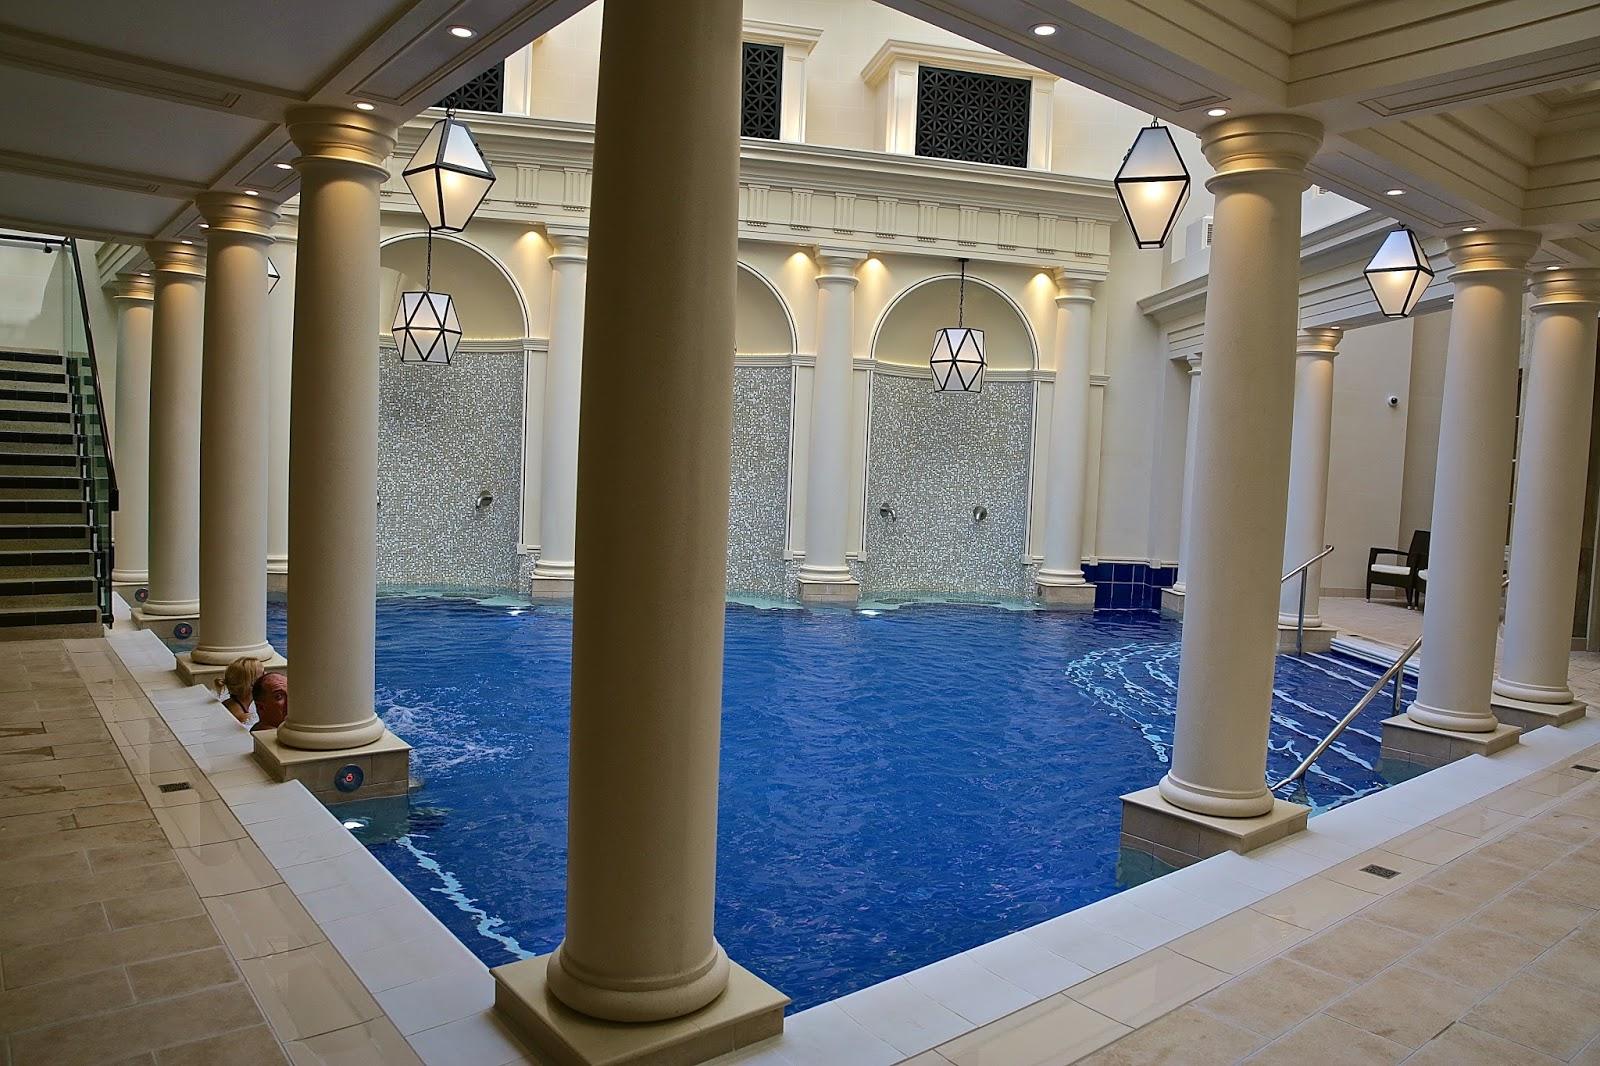 The London Foodie: City of Bath - Giulietta, Roman Baths & the ...